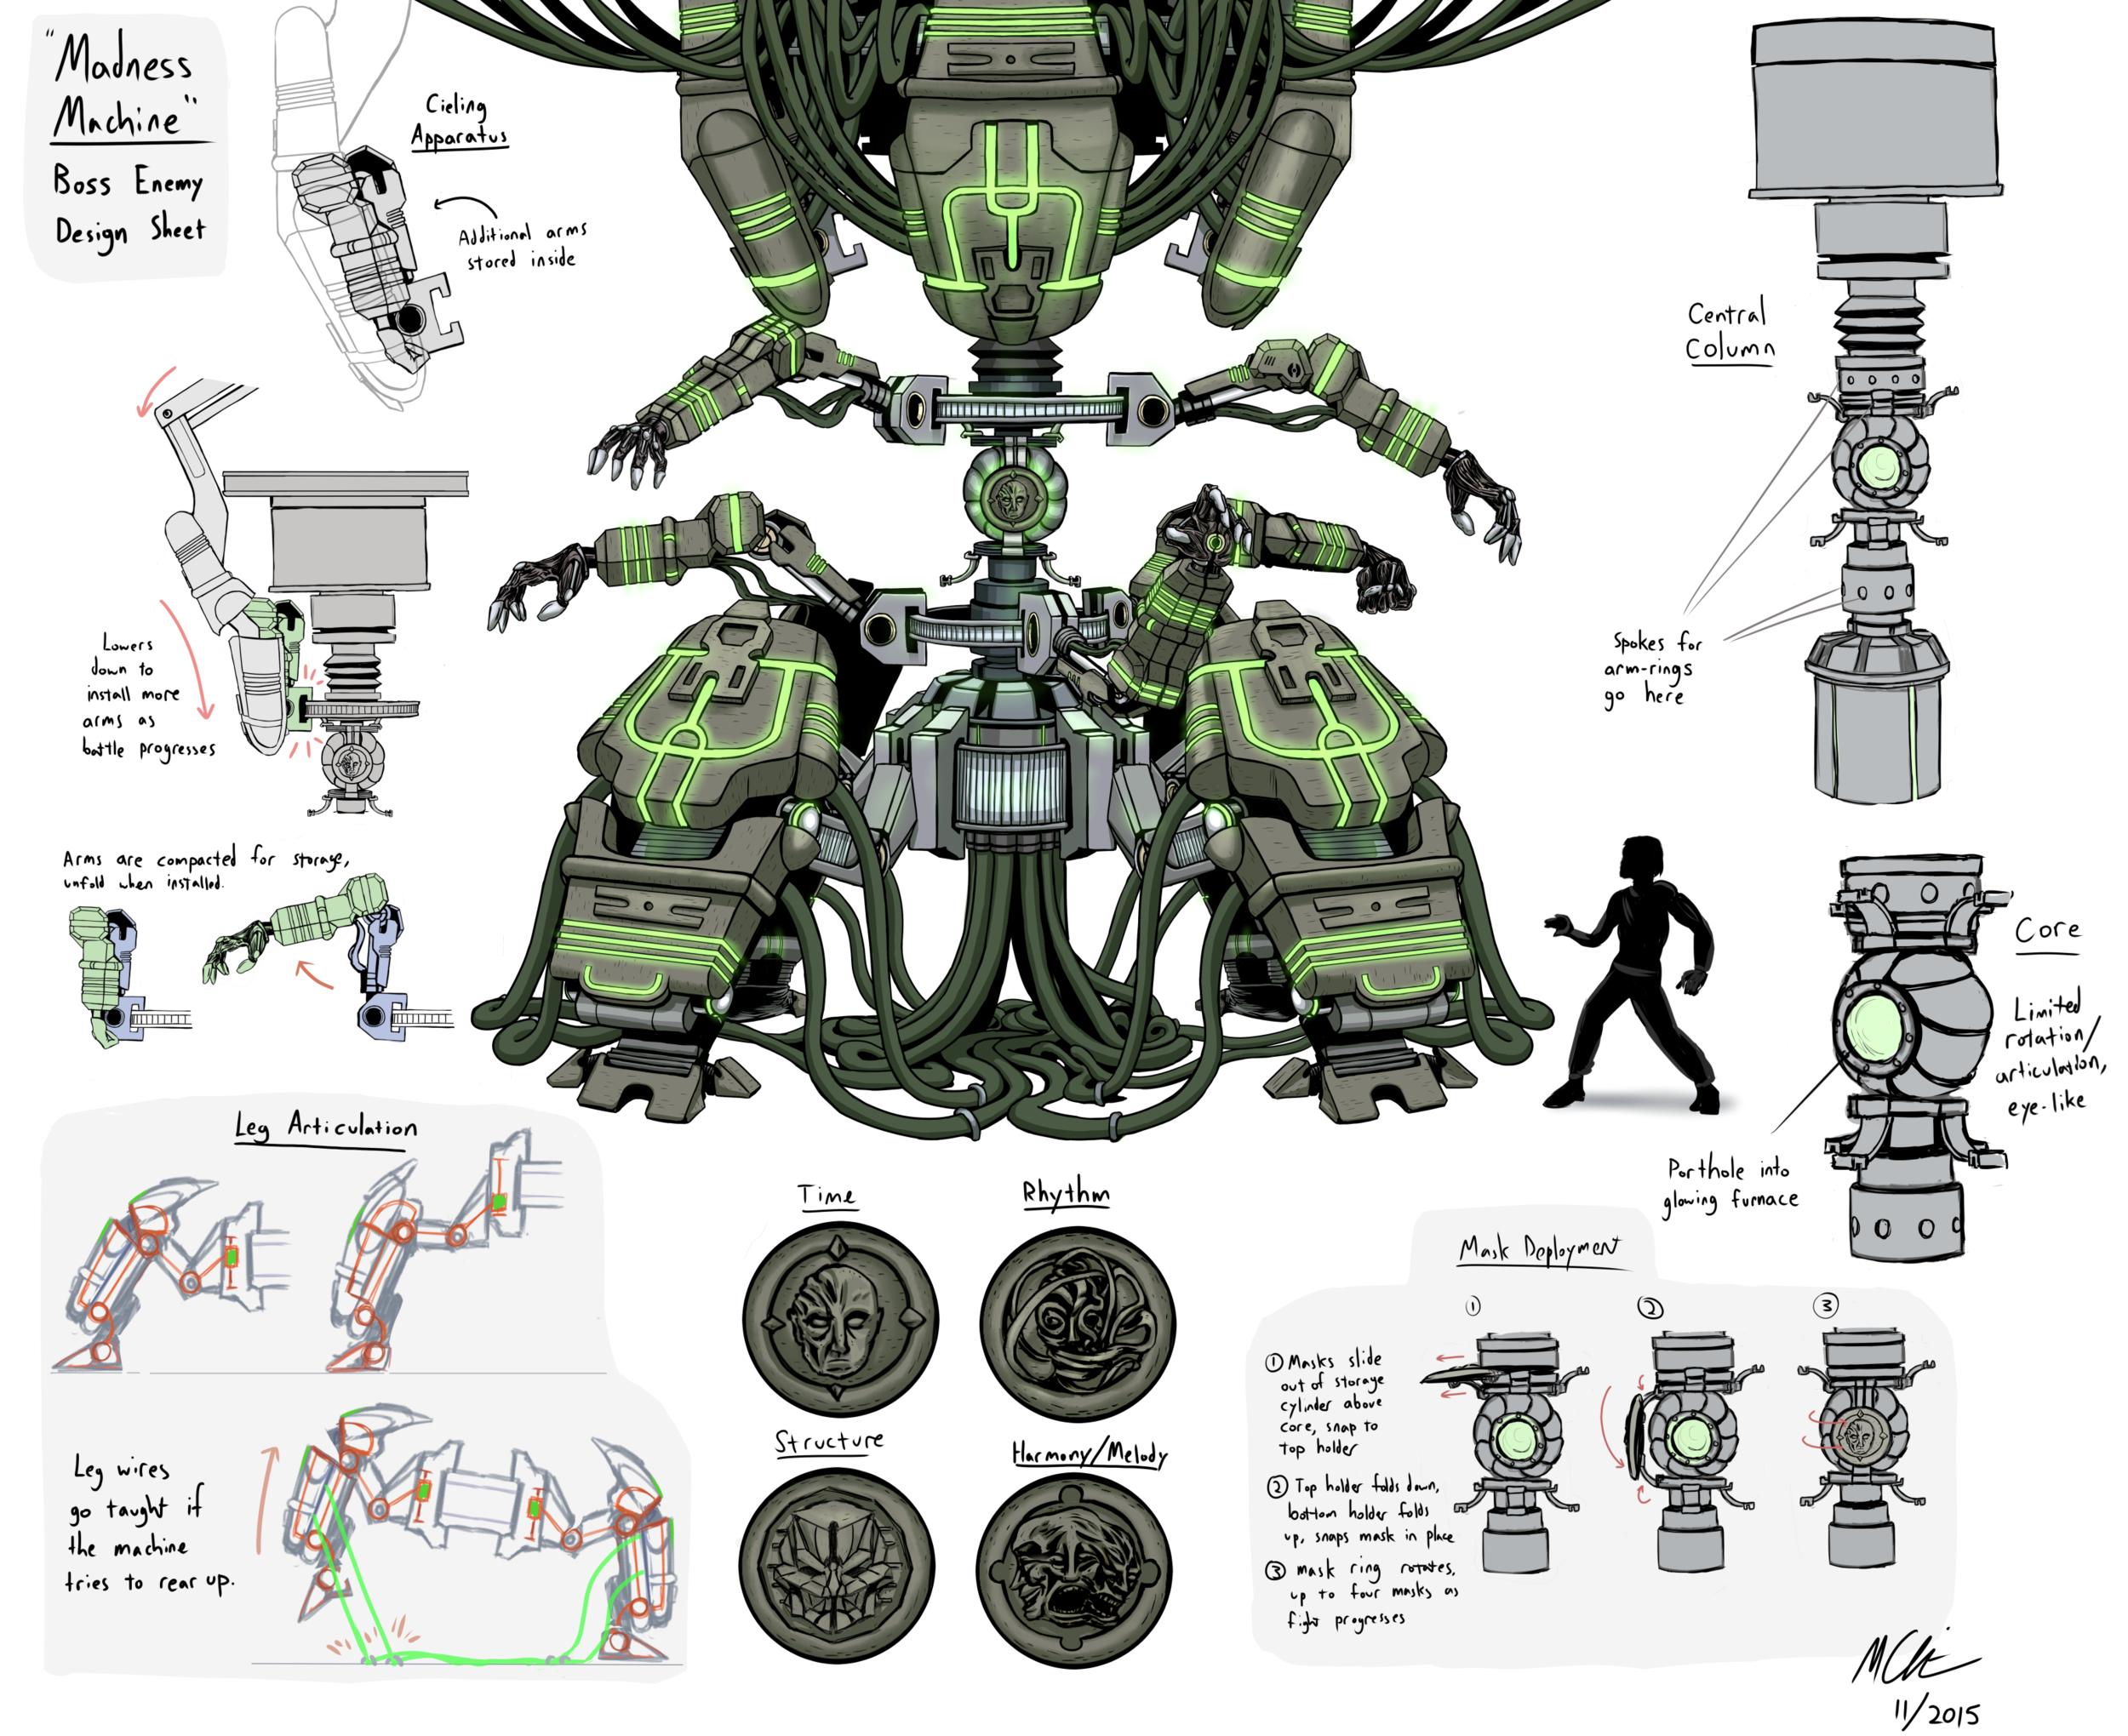 Design Sheet - Madness Machine Boss.png